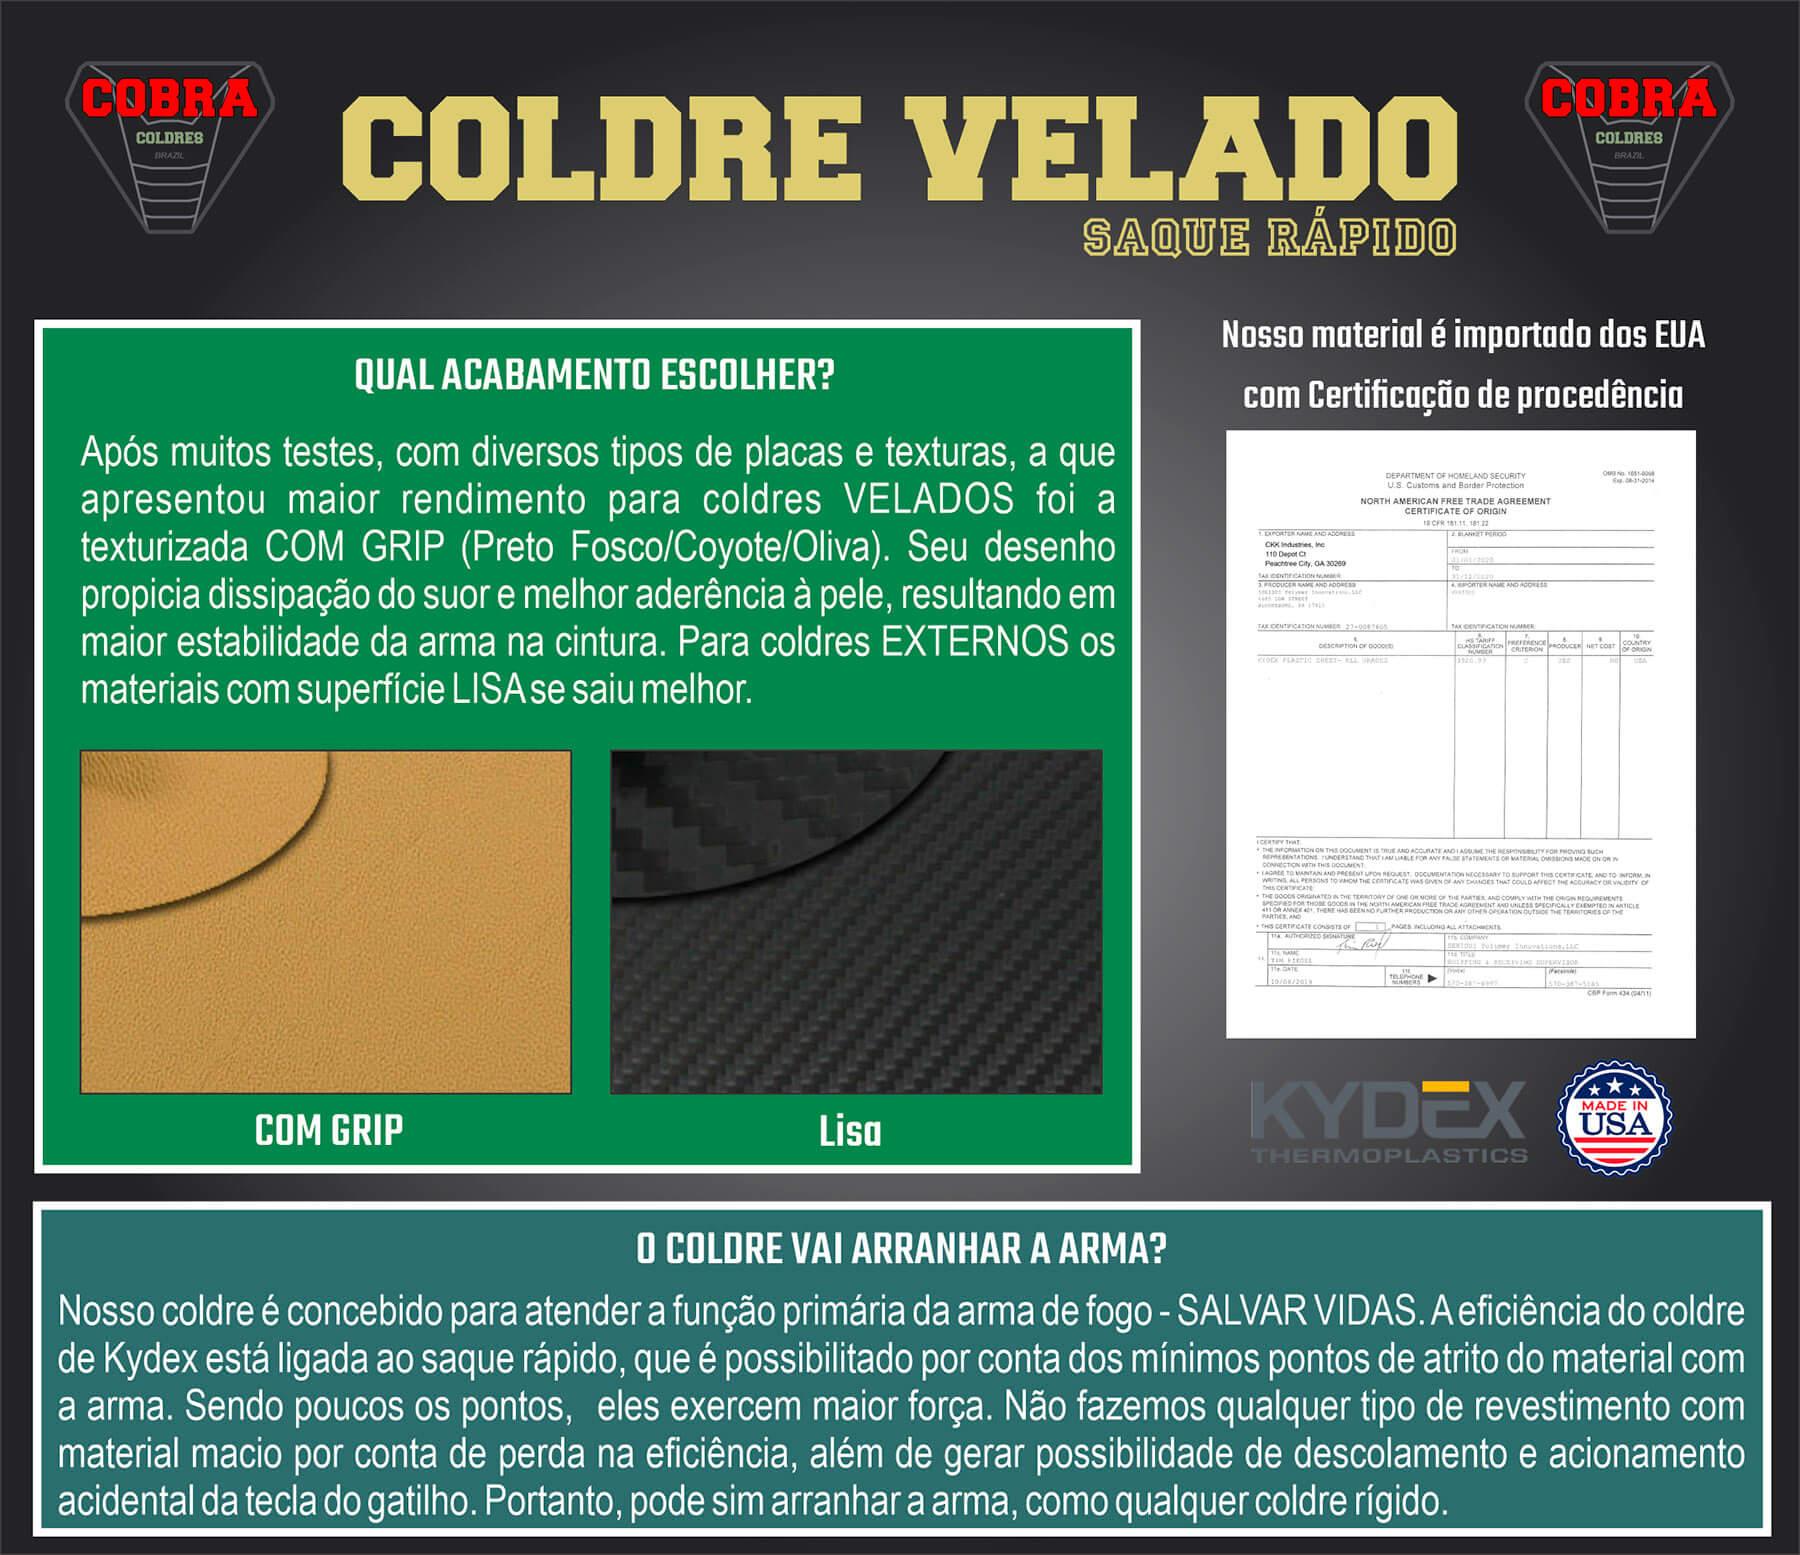 "Coldre [TS9] [TS] Kydex® + 2 Porta-Carregadores - Taurus Striker - Slim - Saque Rápido Velado - 080"""